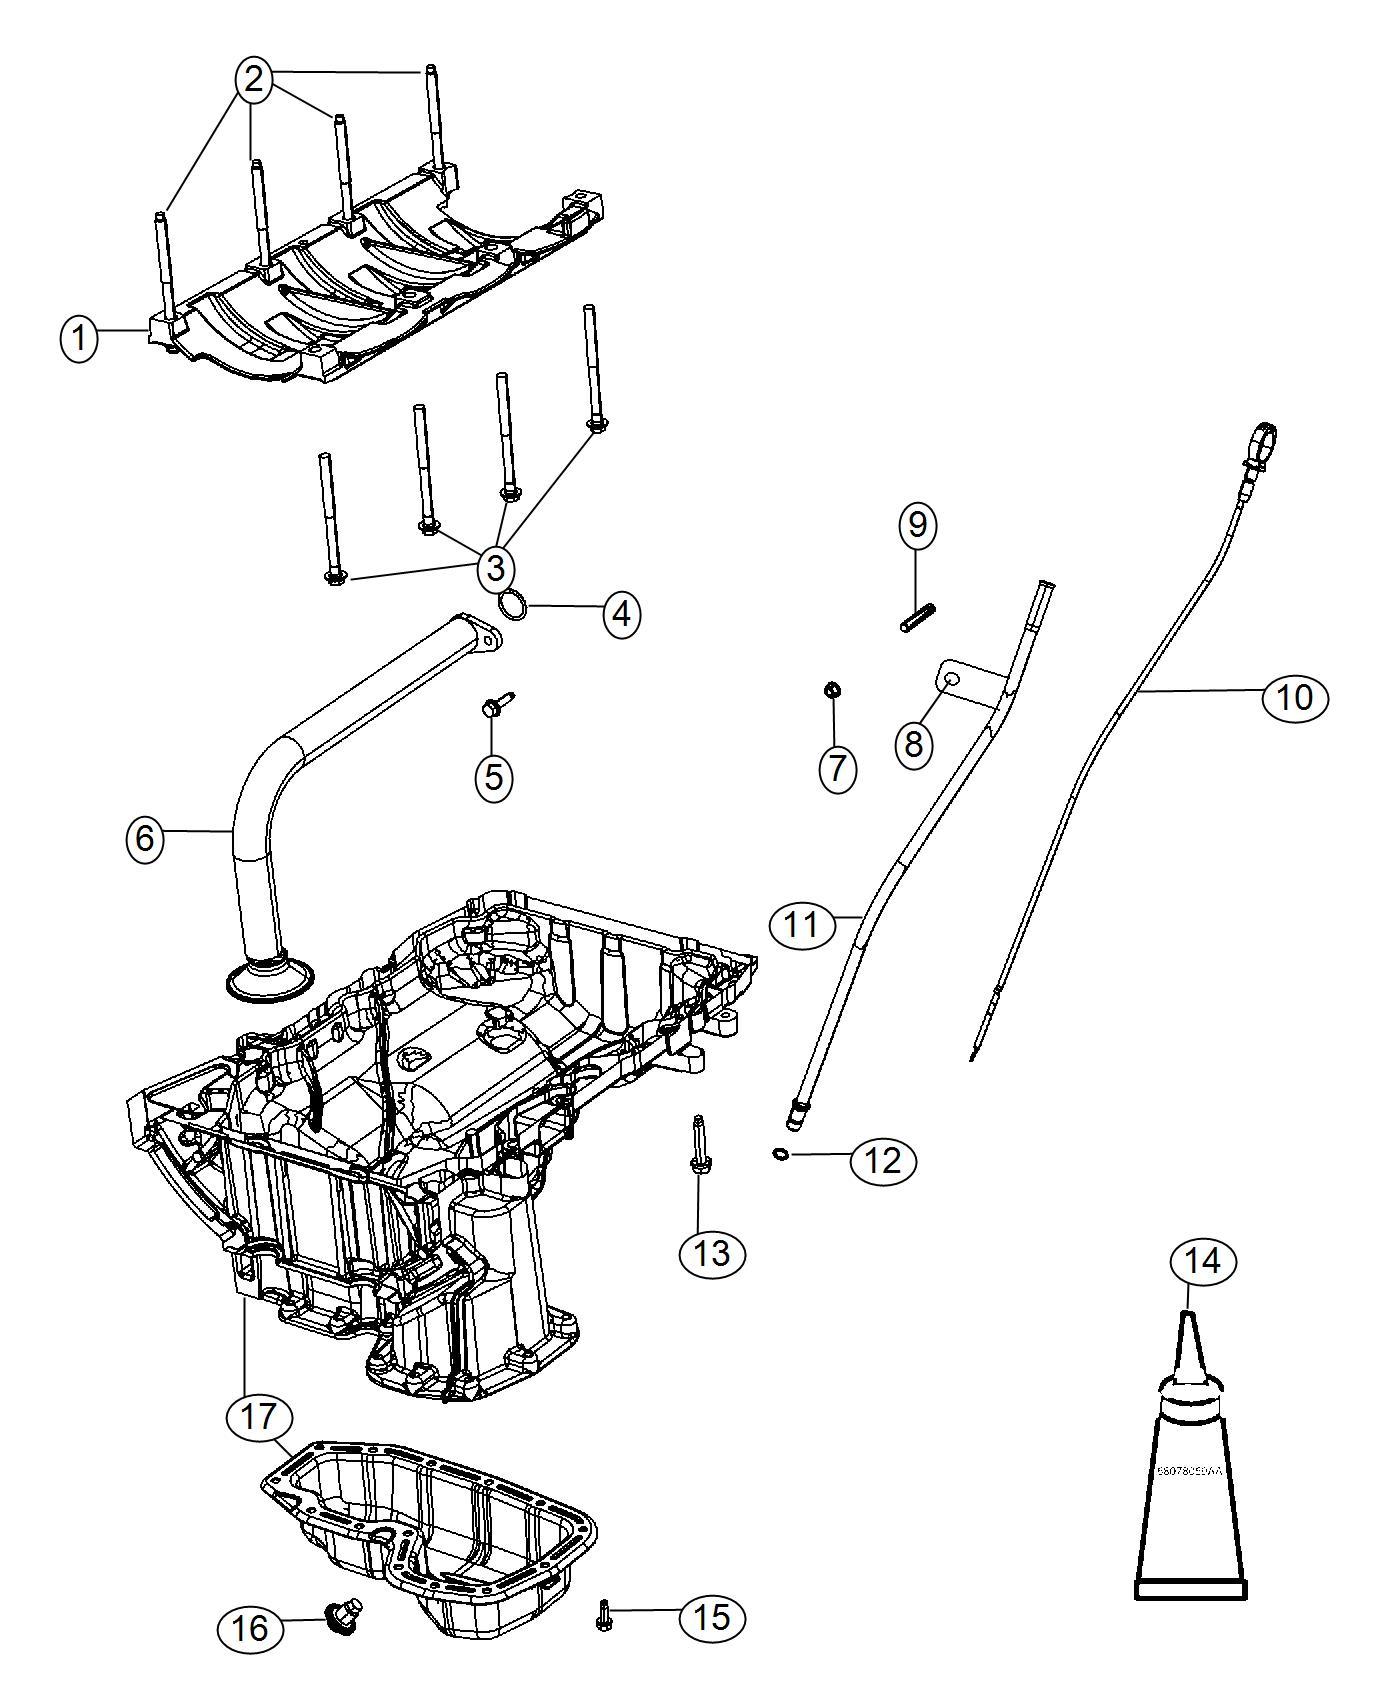 Ram Indicator Engine Oil Level Pan Related